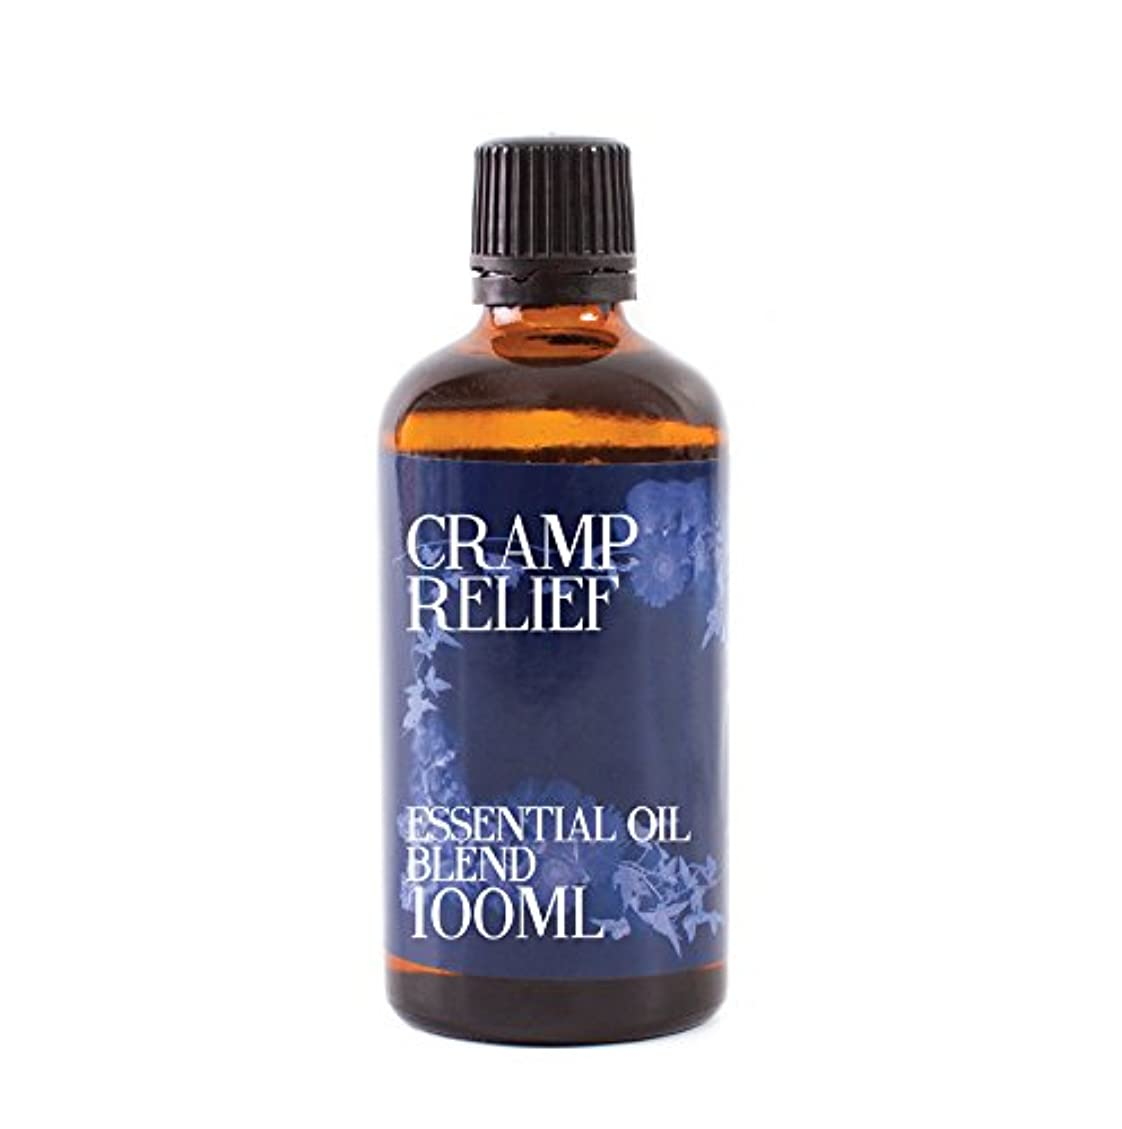 上向き野心的野心的Mystix London | Cramp Relief Essential Oil Blend - 100ml - 100% Pure